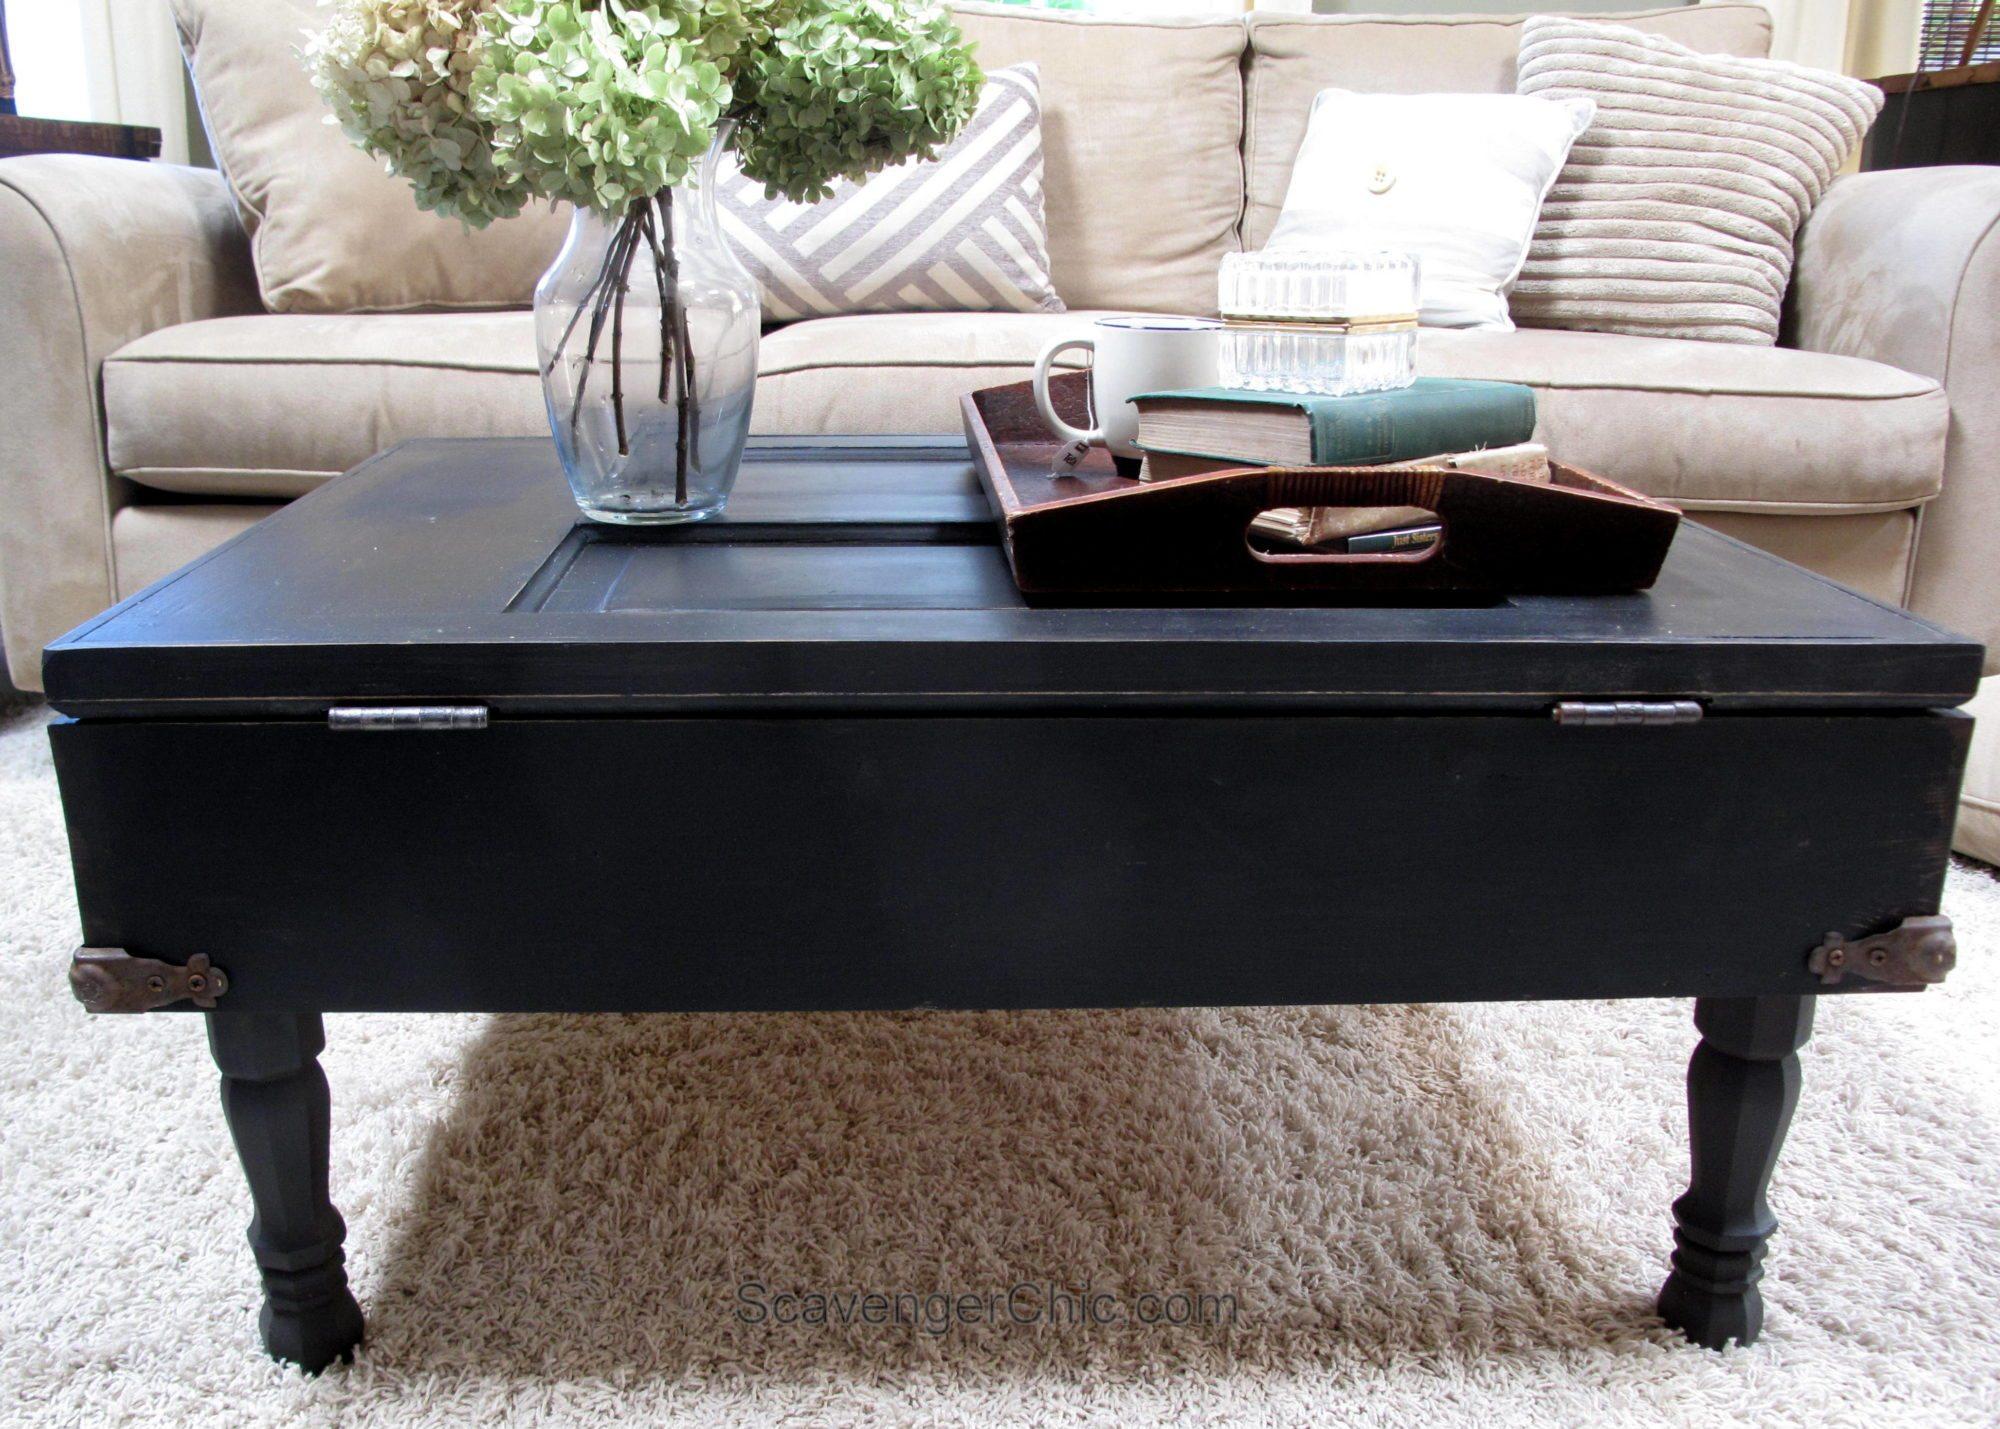 How to make a Vintage Door Coffee Table with pallet wood. Step by step directions.  #MyRepurposedLife #scavengerChic #repurposed #furniture #door #coffeetable  via @repurposedlife